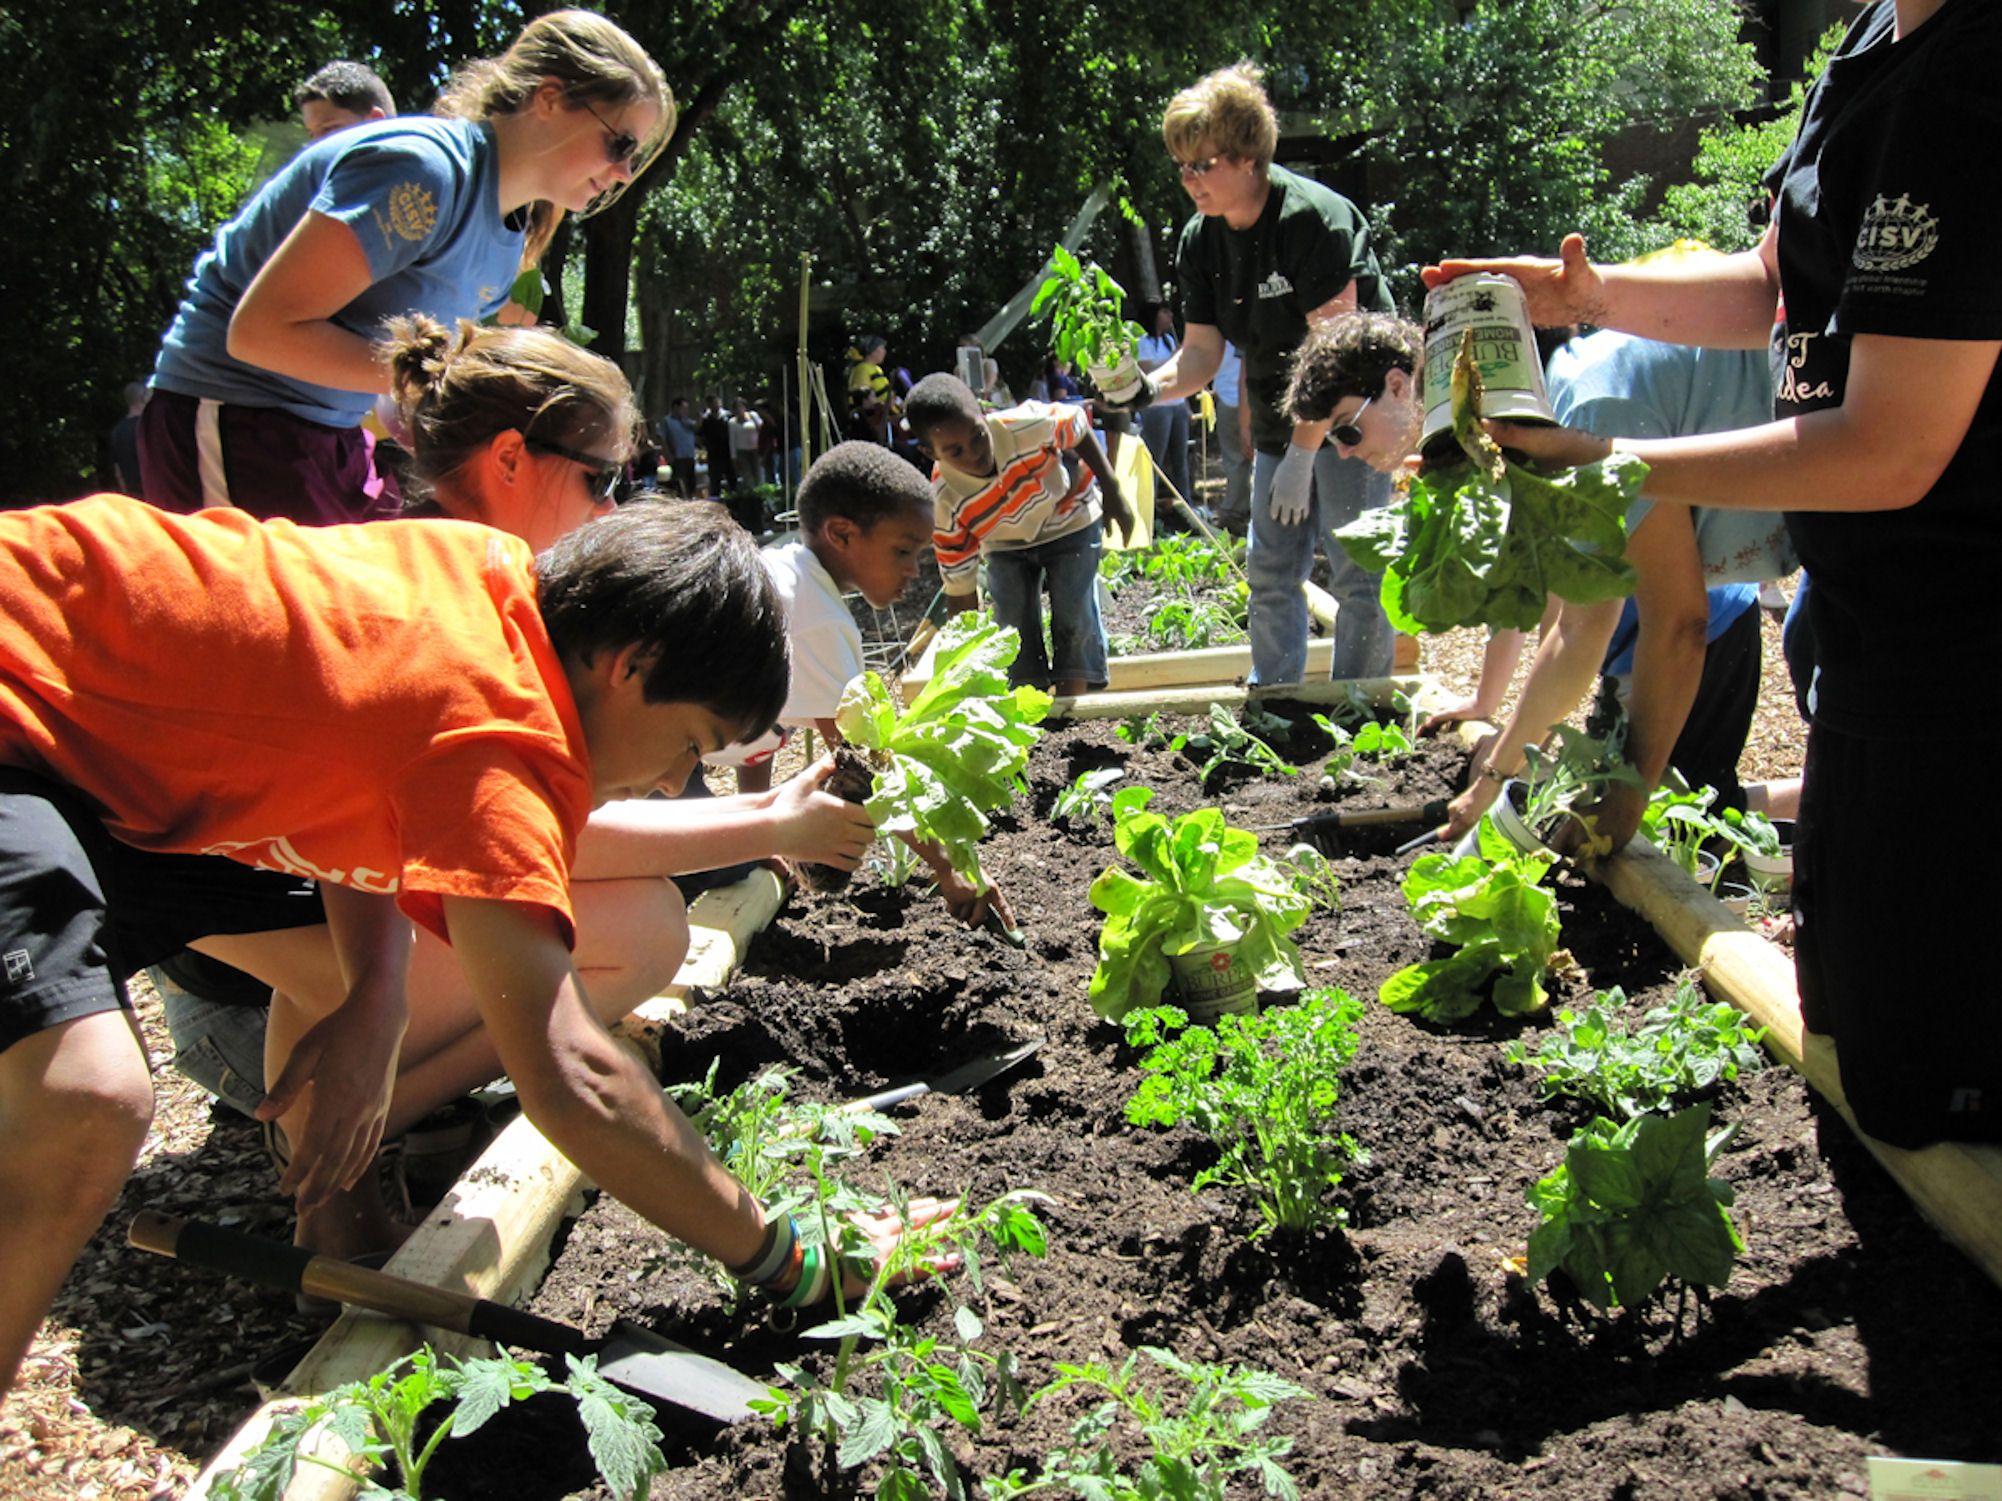 Genial Kids In Vegetable Garden   Google Search